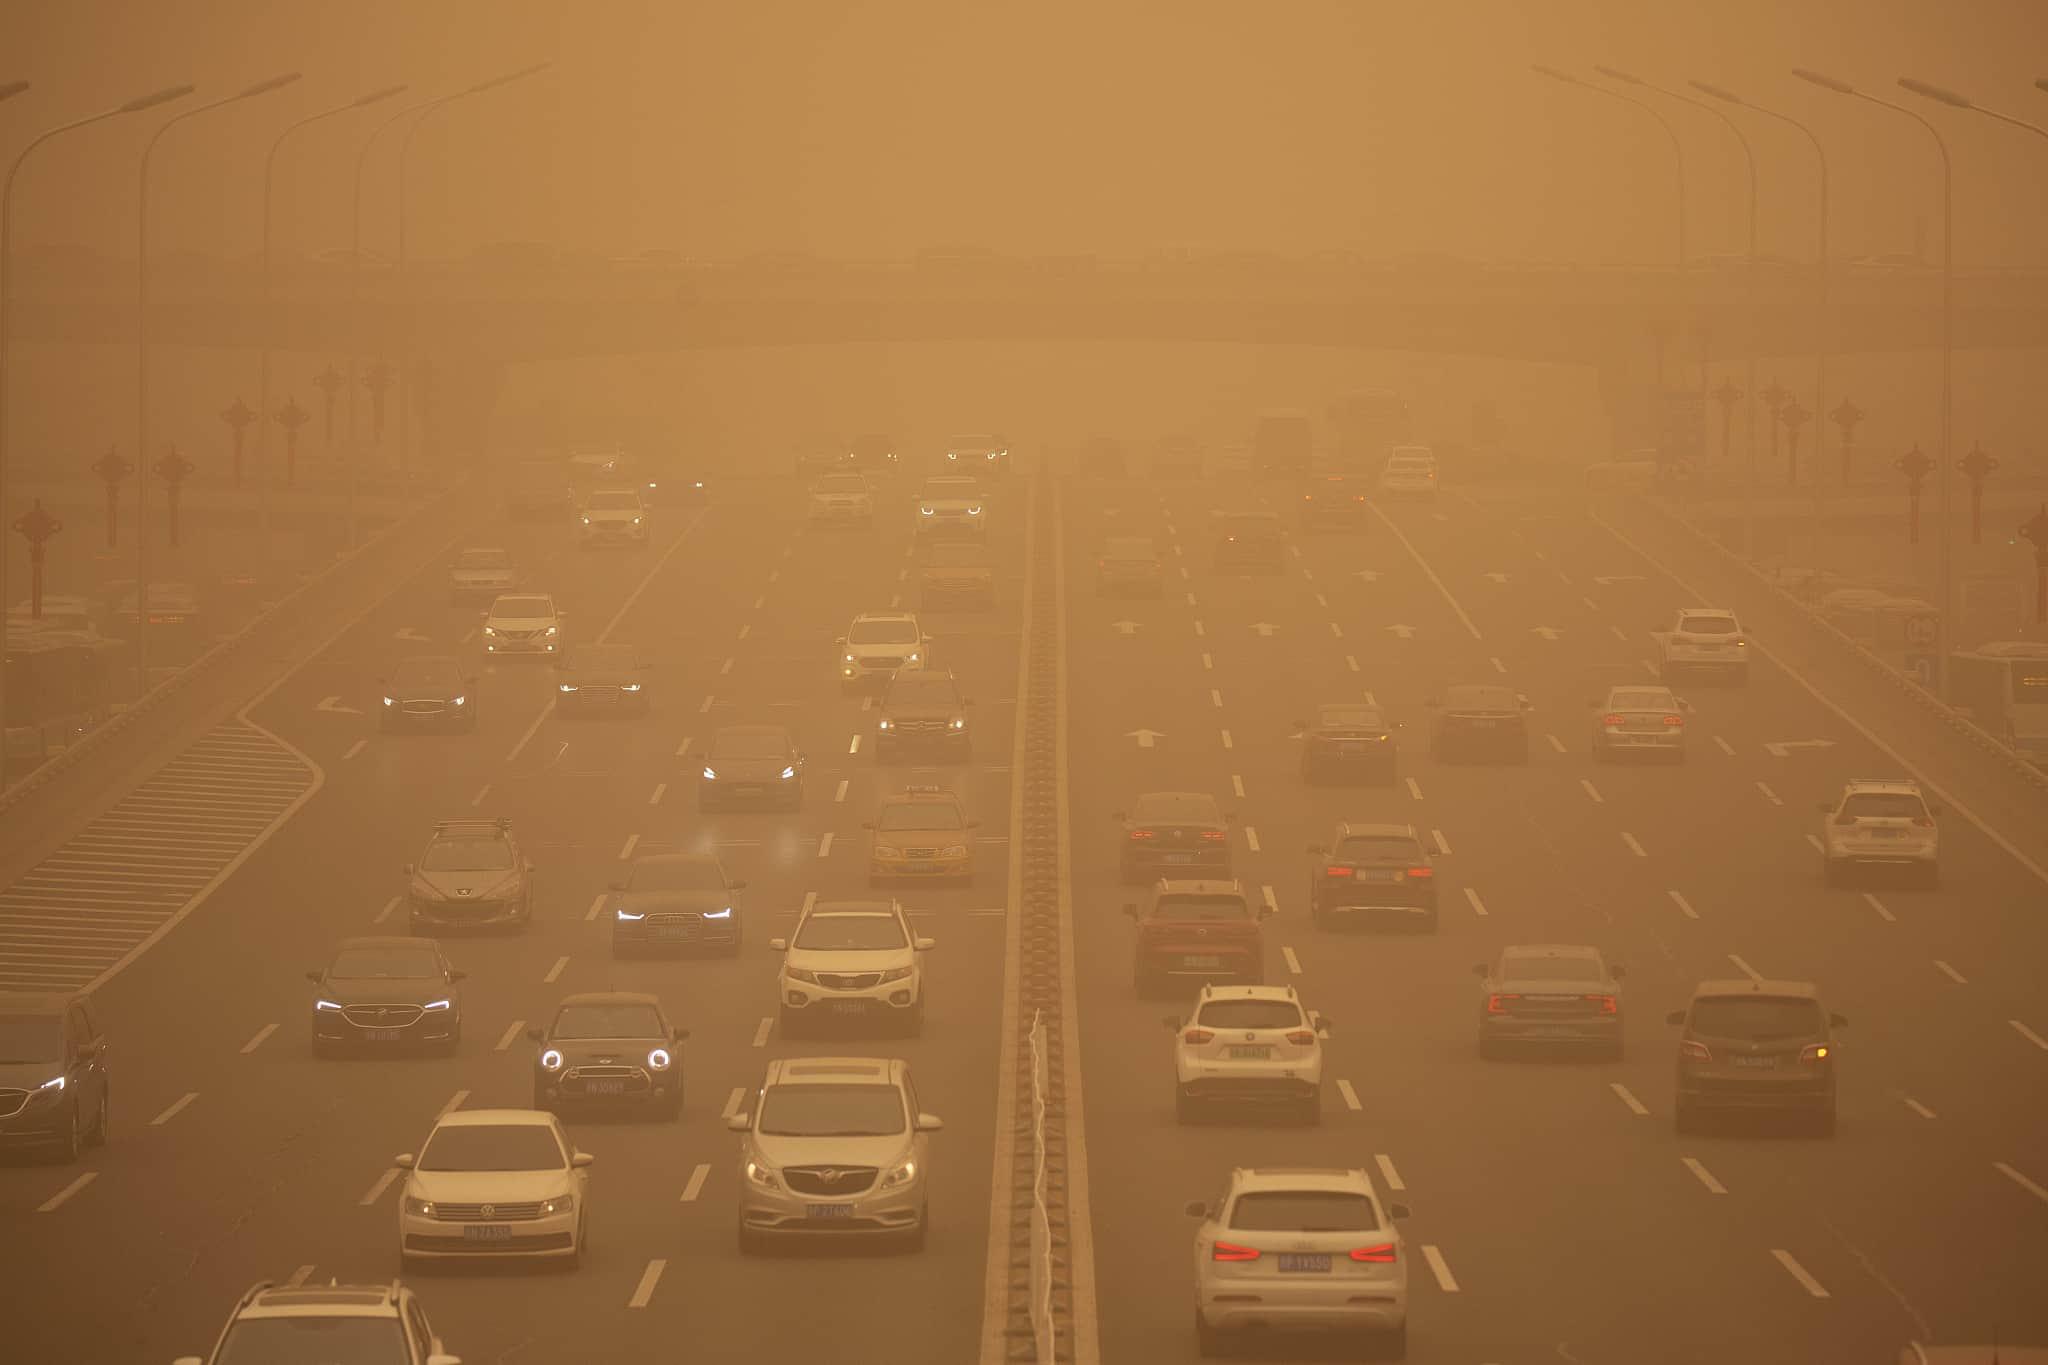 Erős homokvihar lepte el Pekinget 9